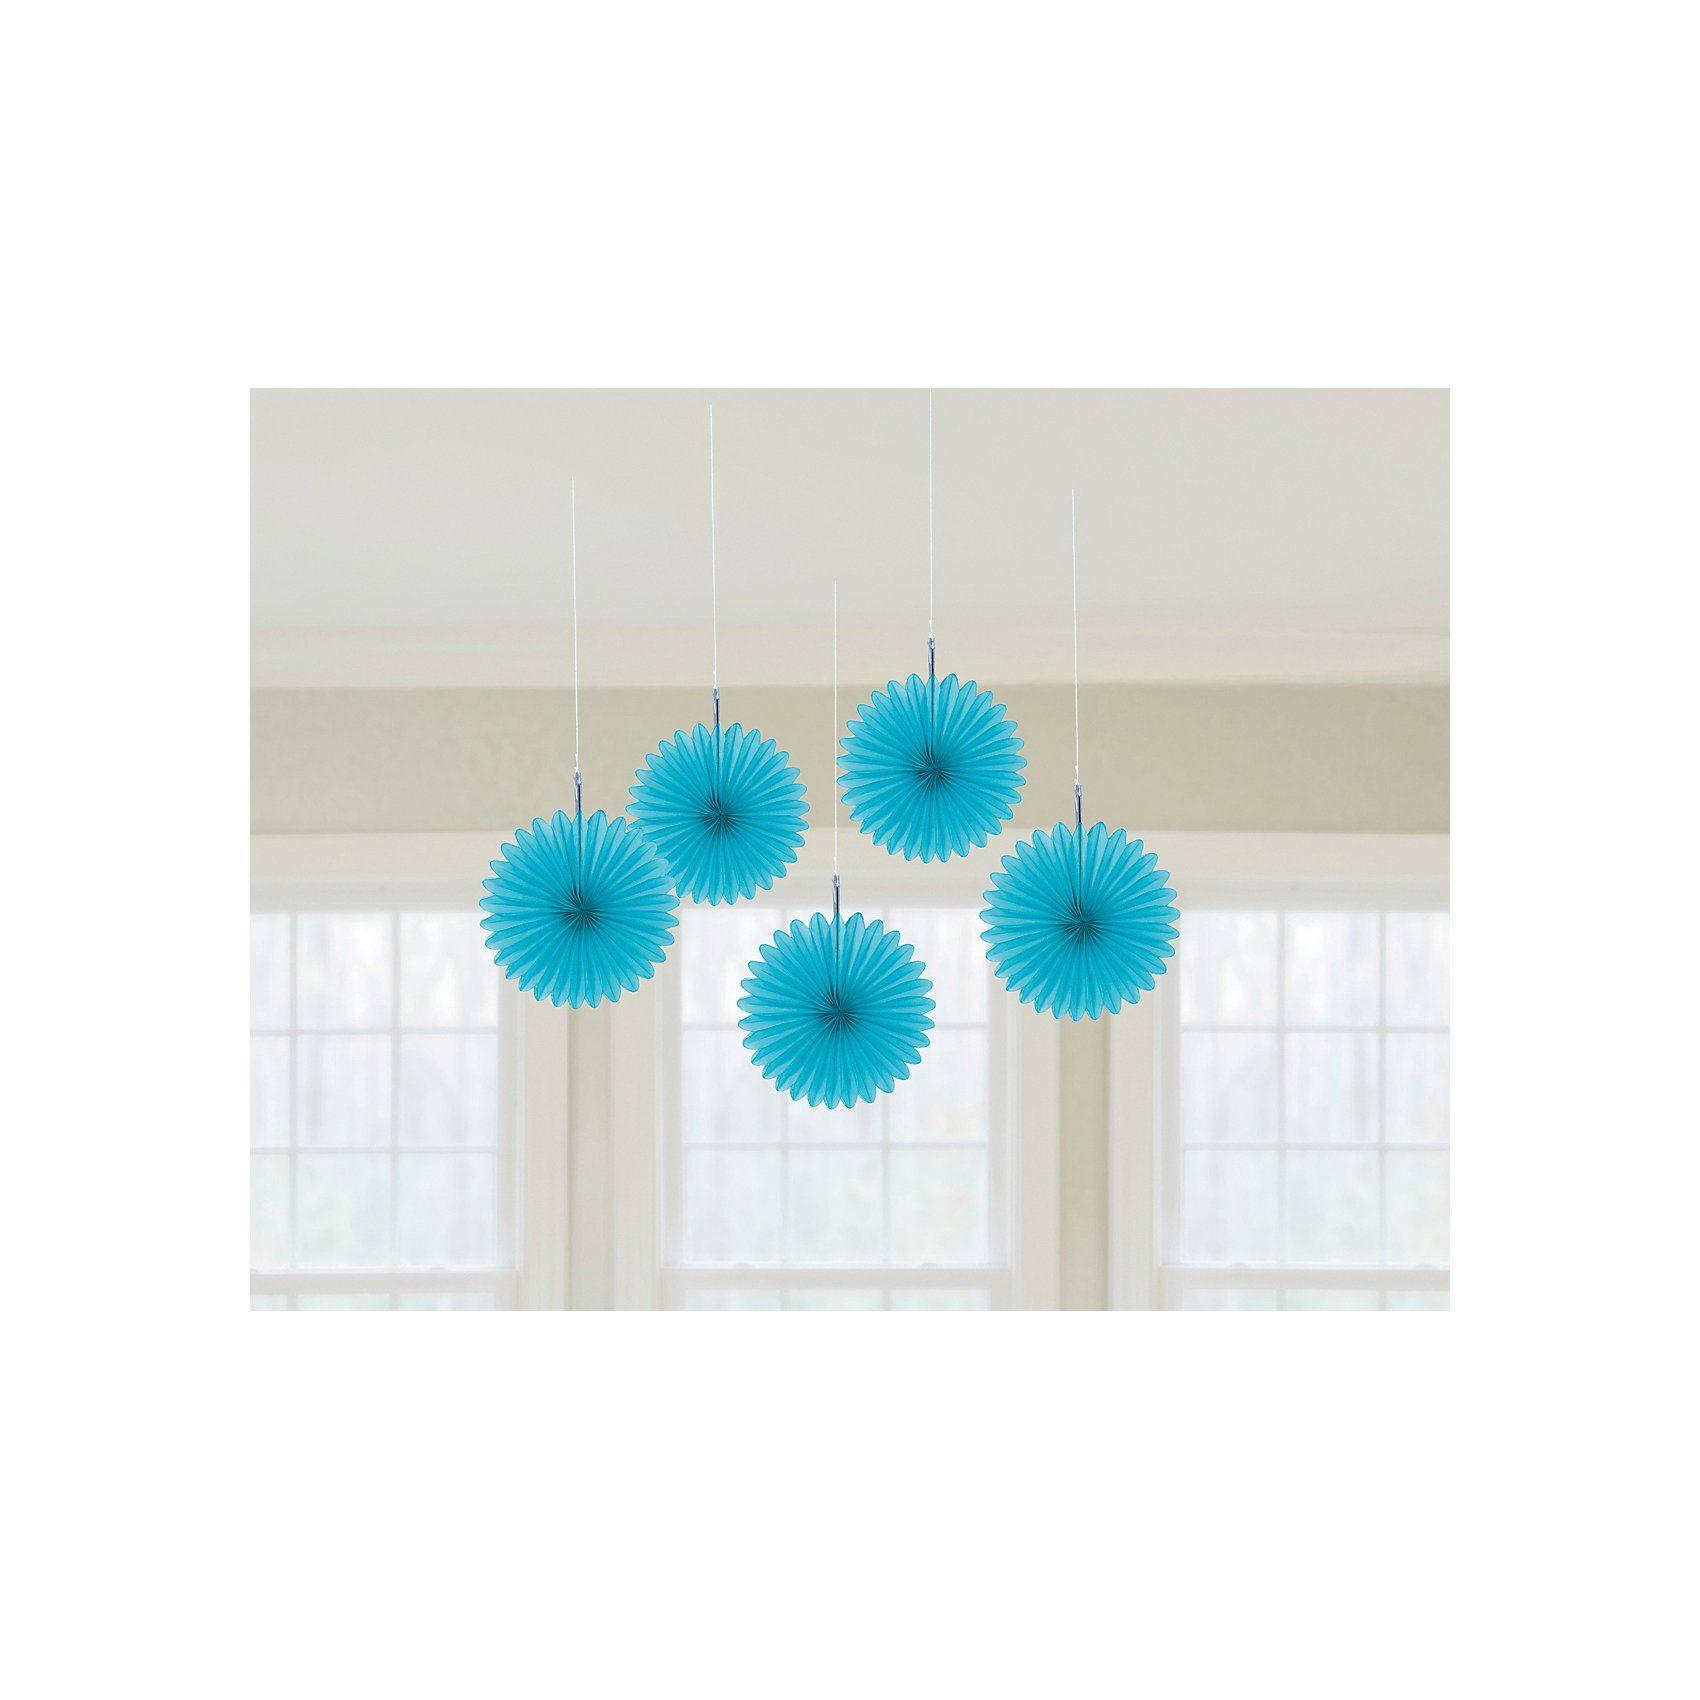 Amscan Deko-Fächer hellblau, 5 Stück